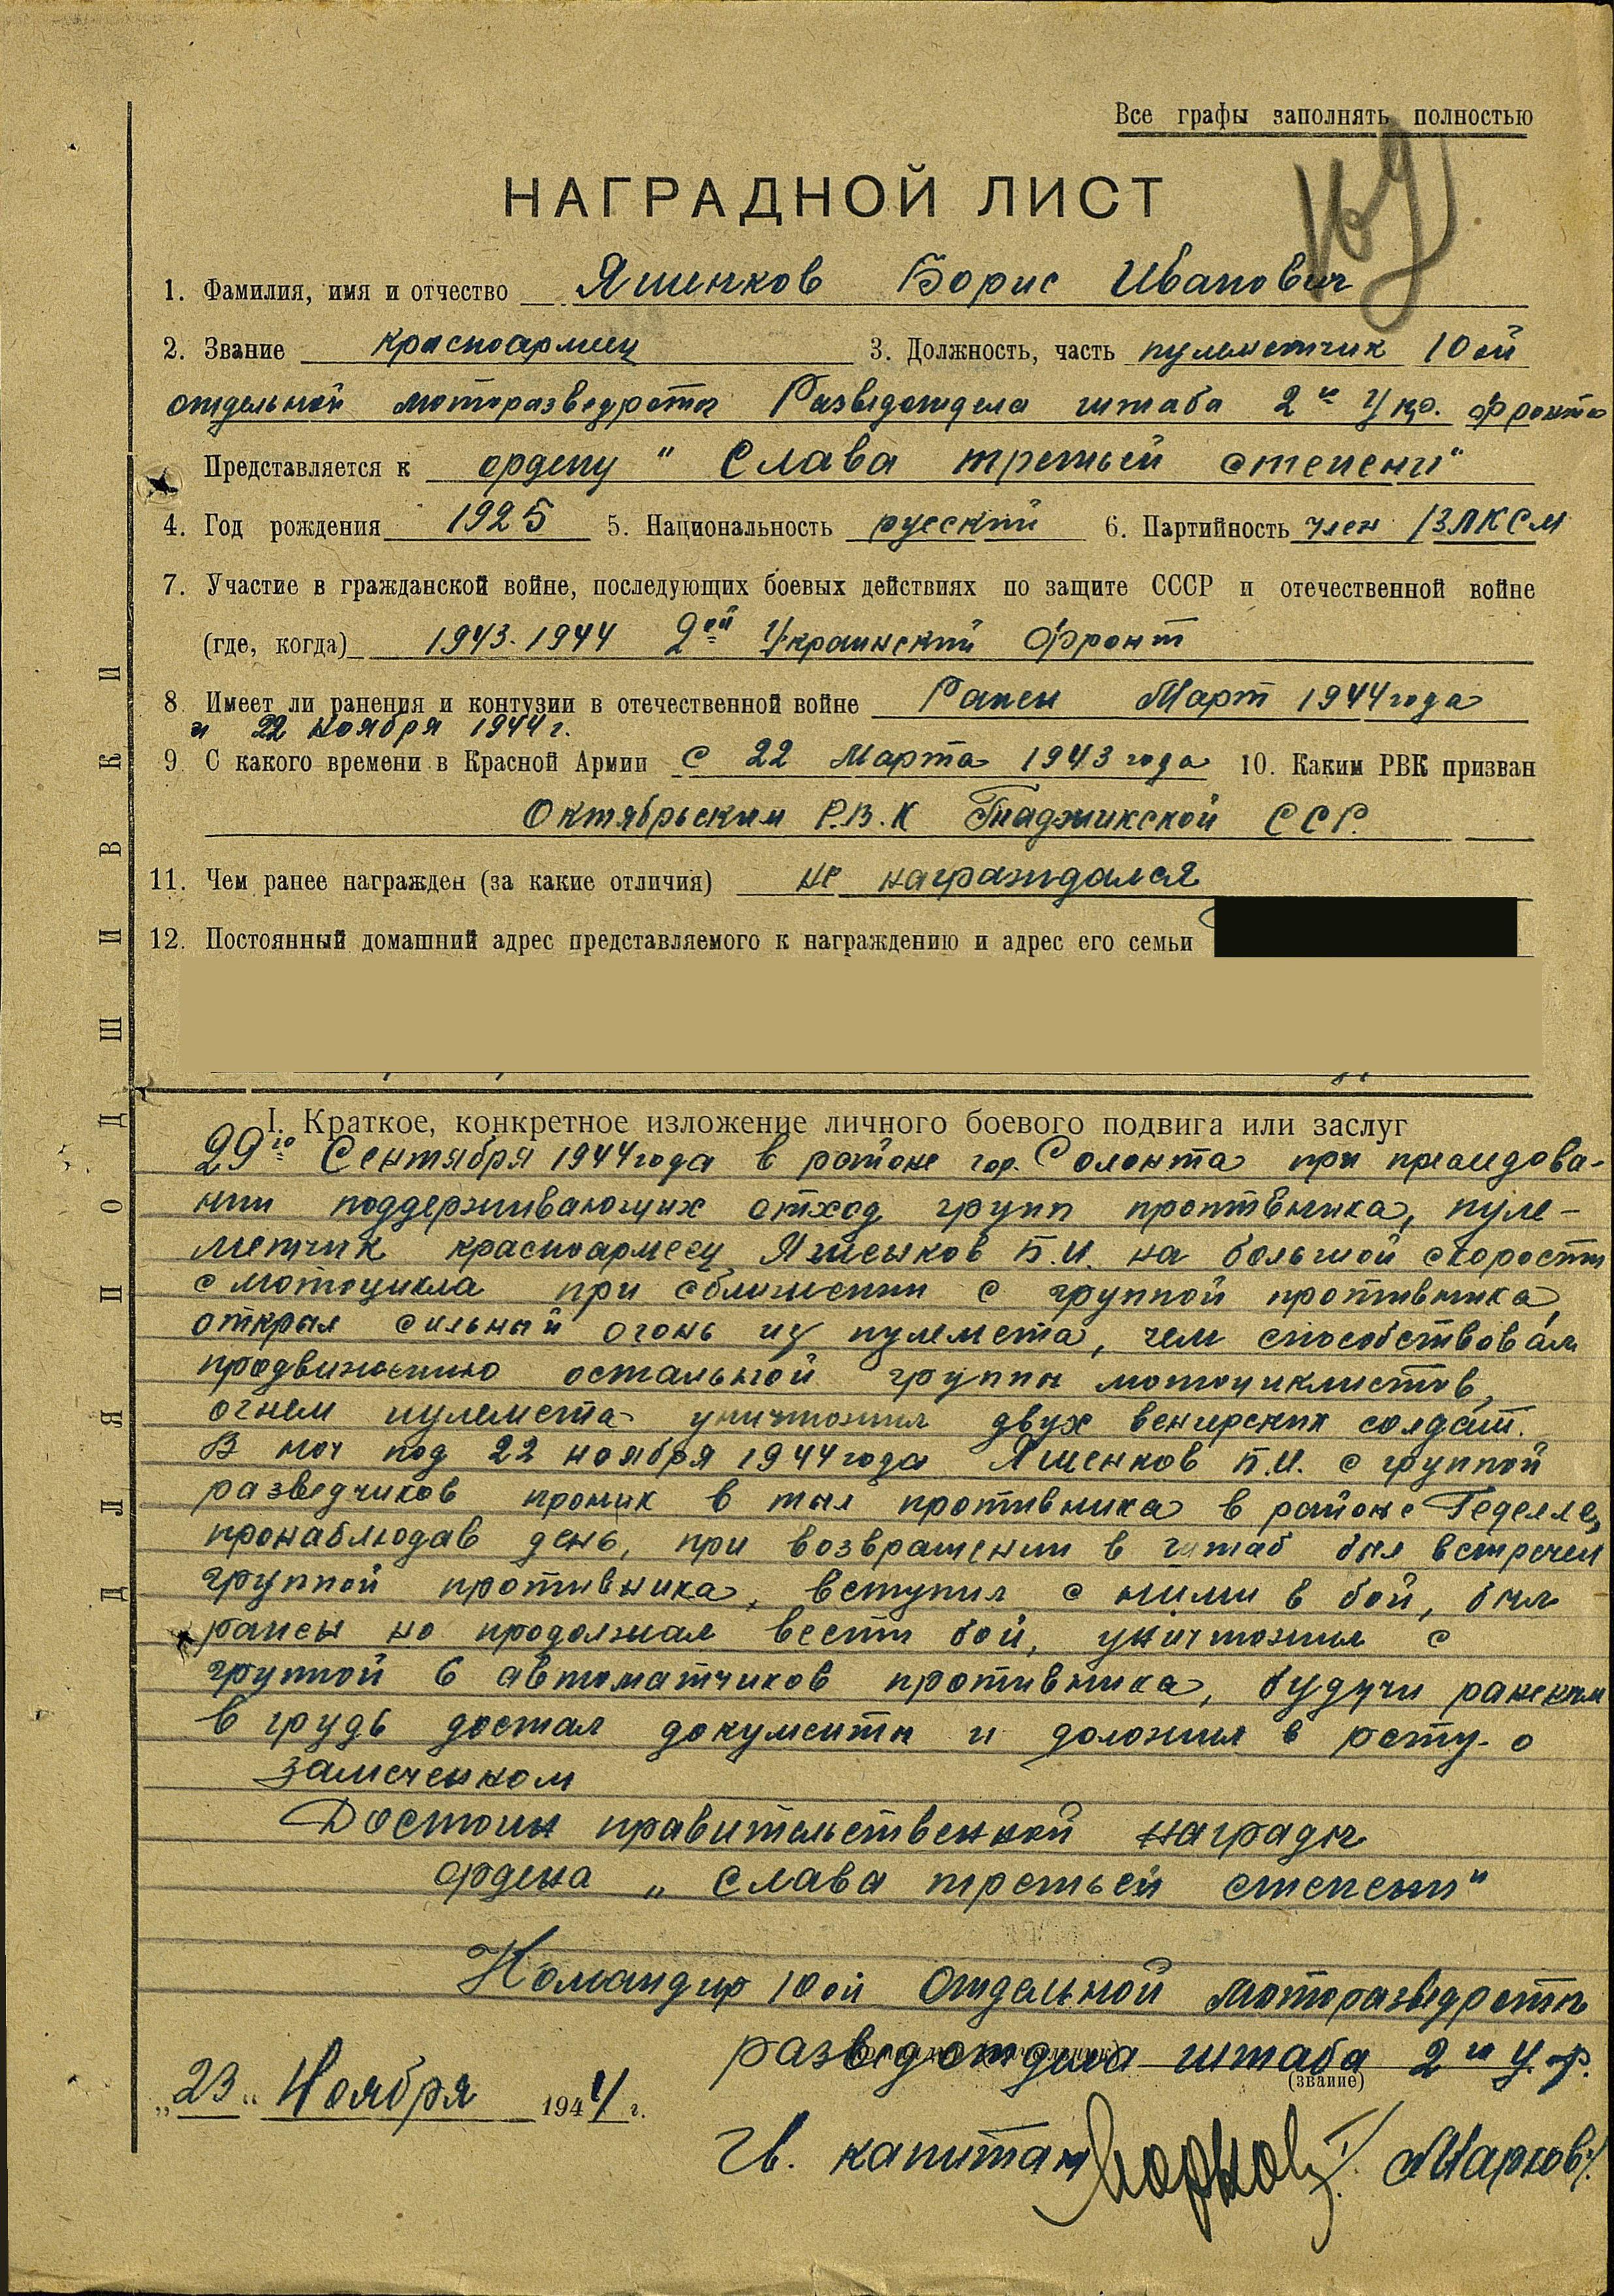 Наградной лист к ордену Славы III степени Яшенкова Бориса Ивановича